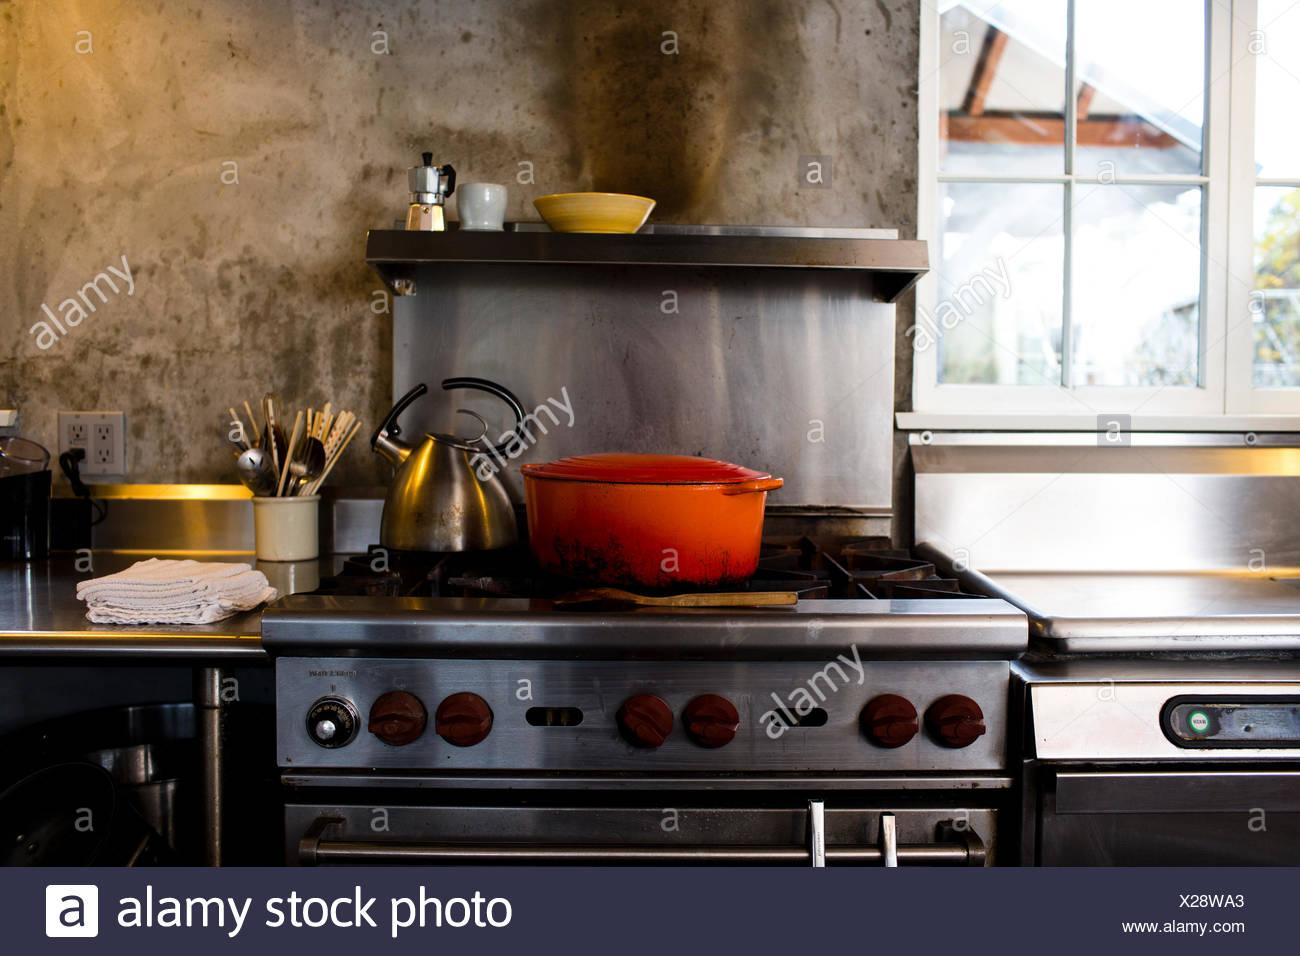 Soup Kettle Stockfotos & Soup Kettle Bilder - Seite 3 - Alamy